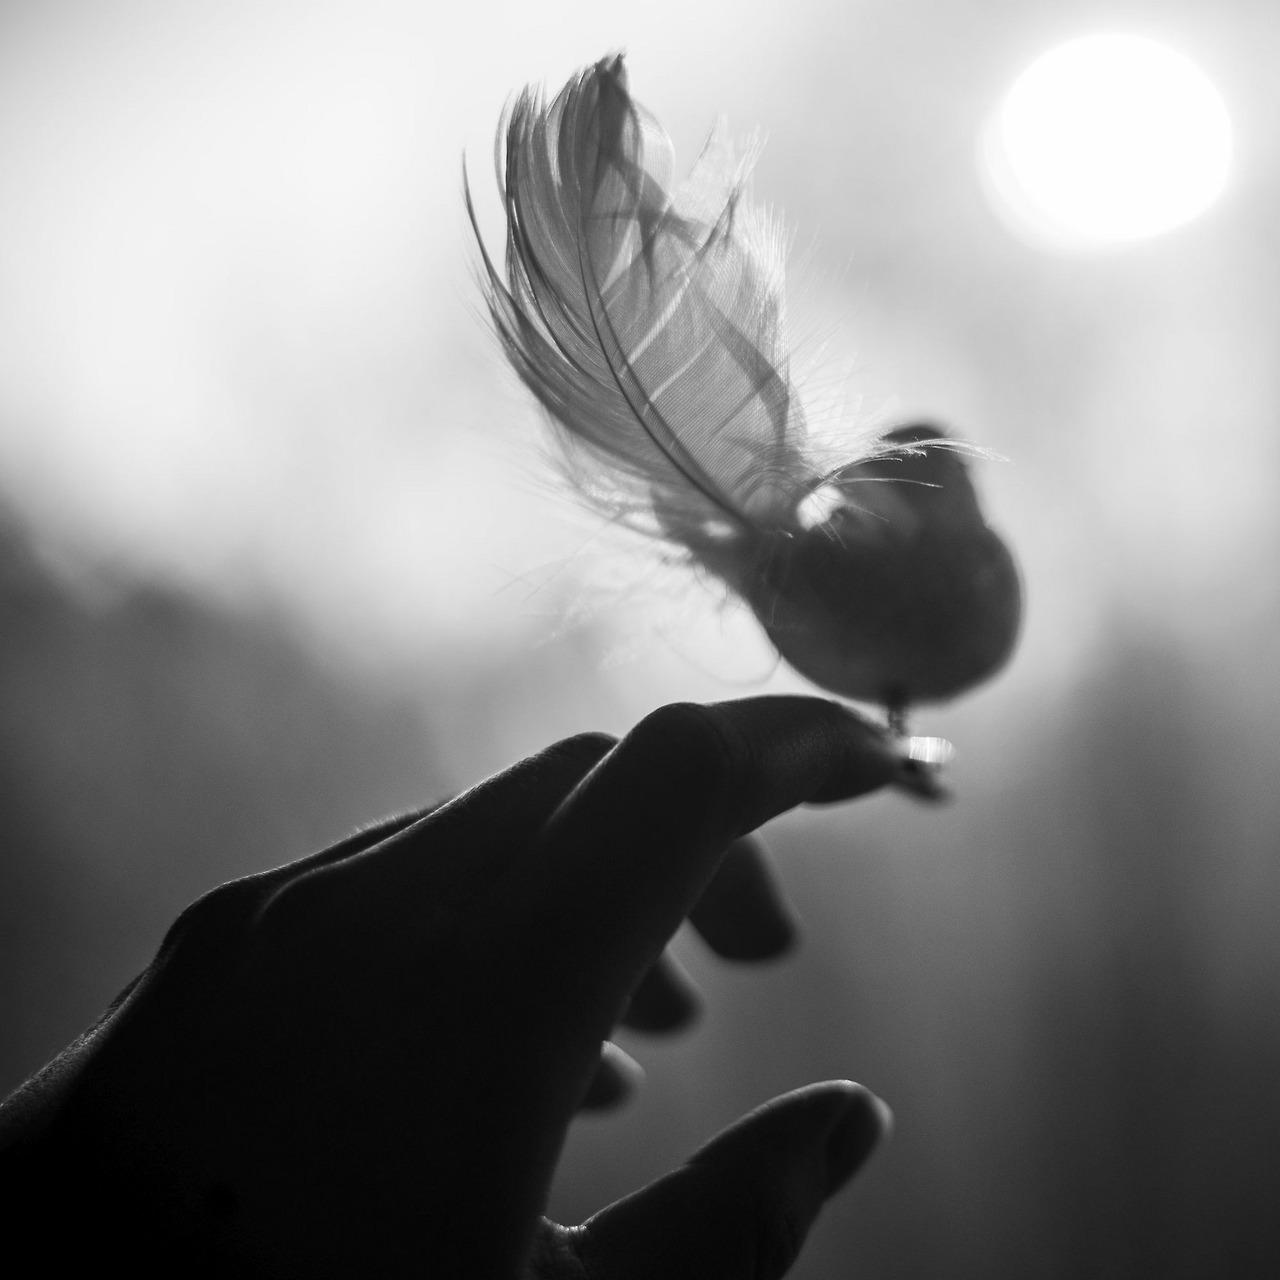 Рука и птица картинка